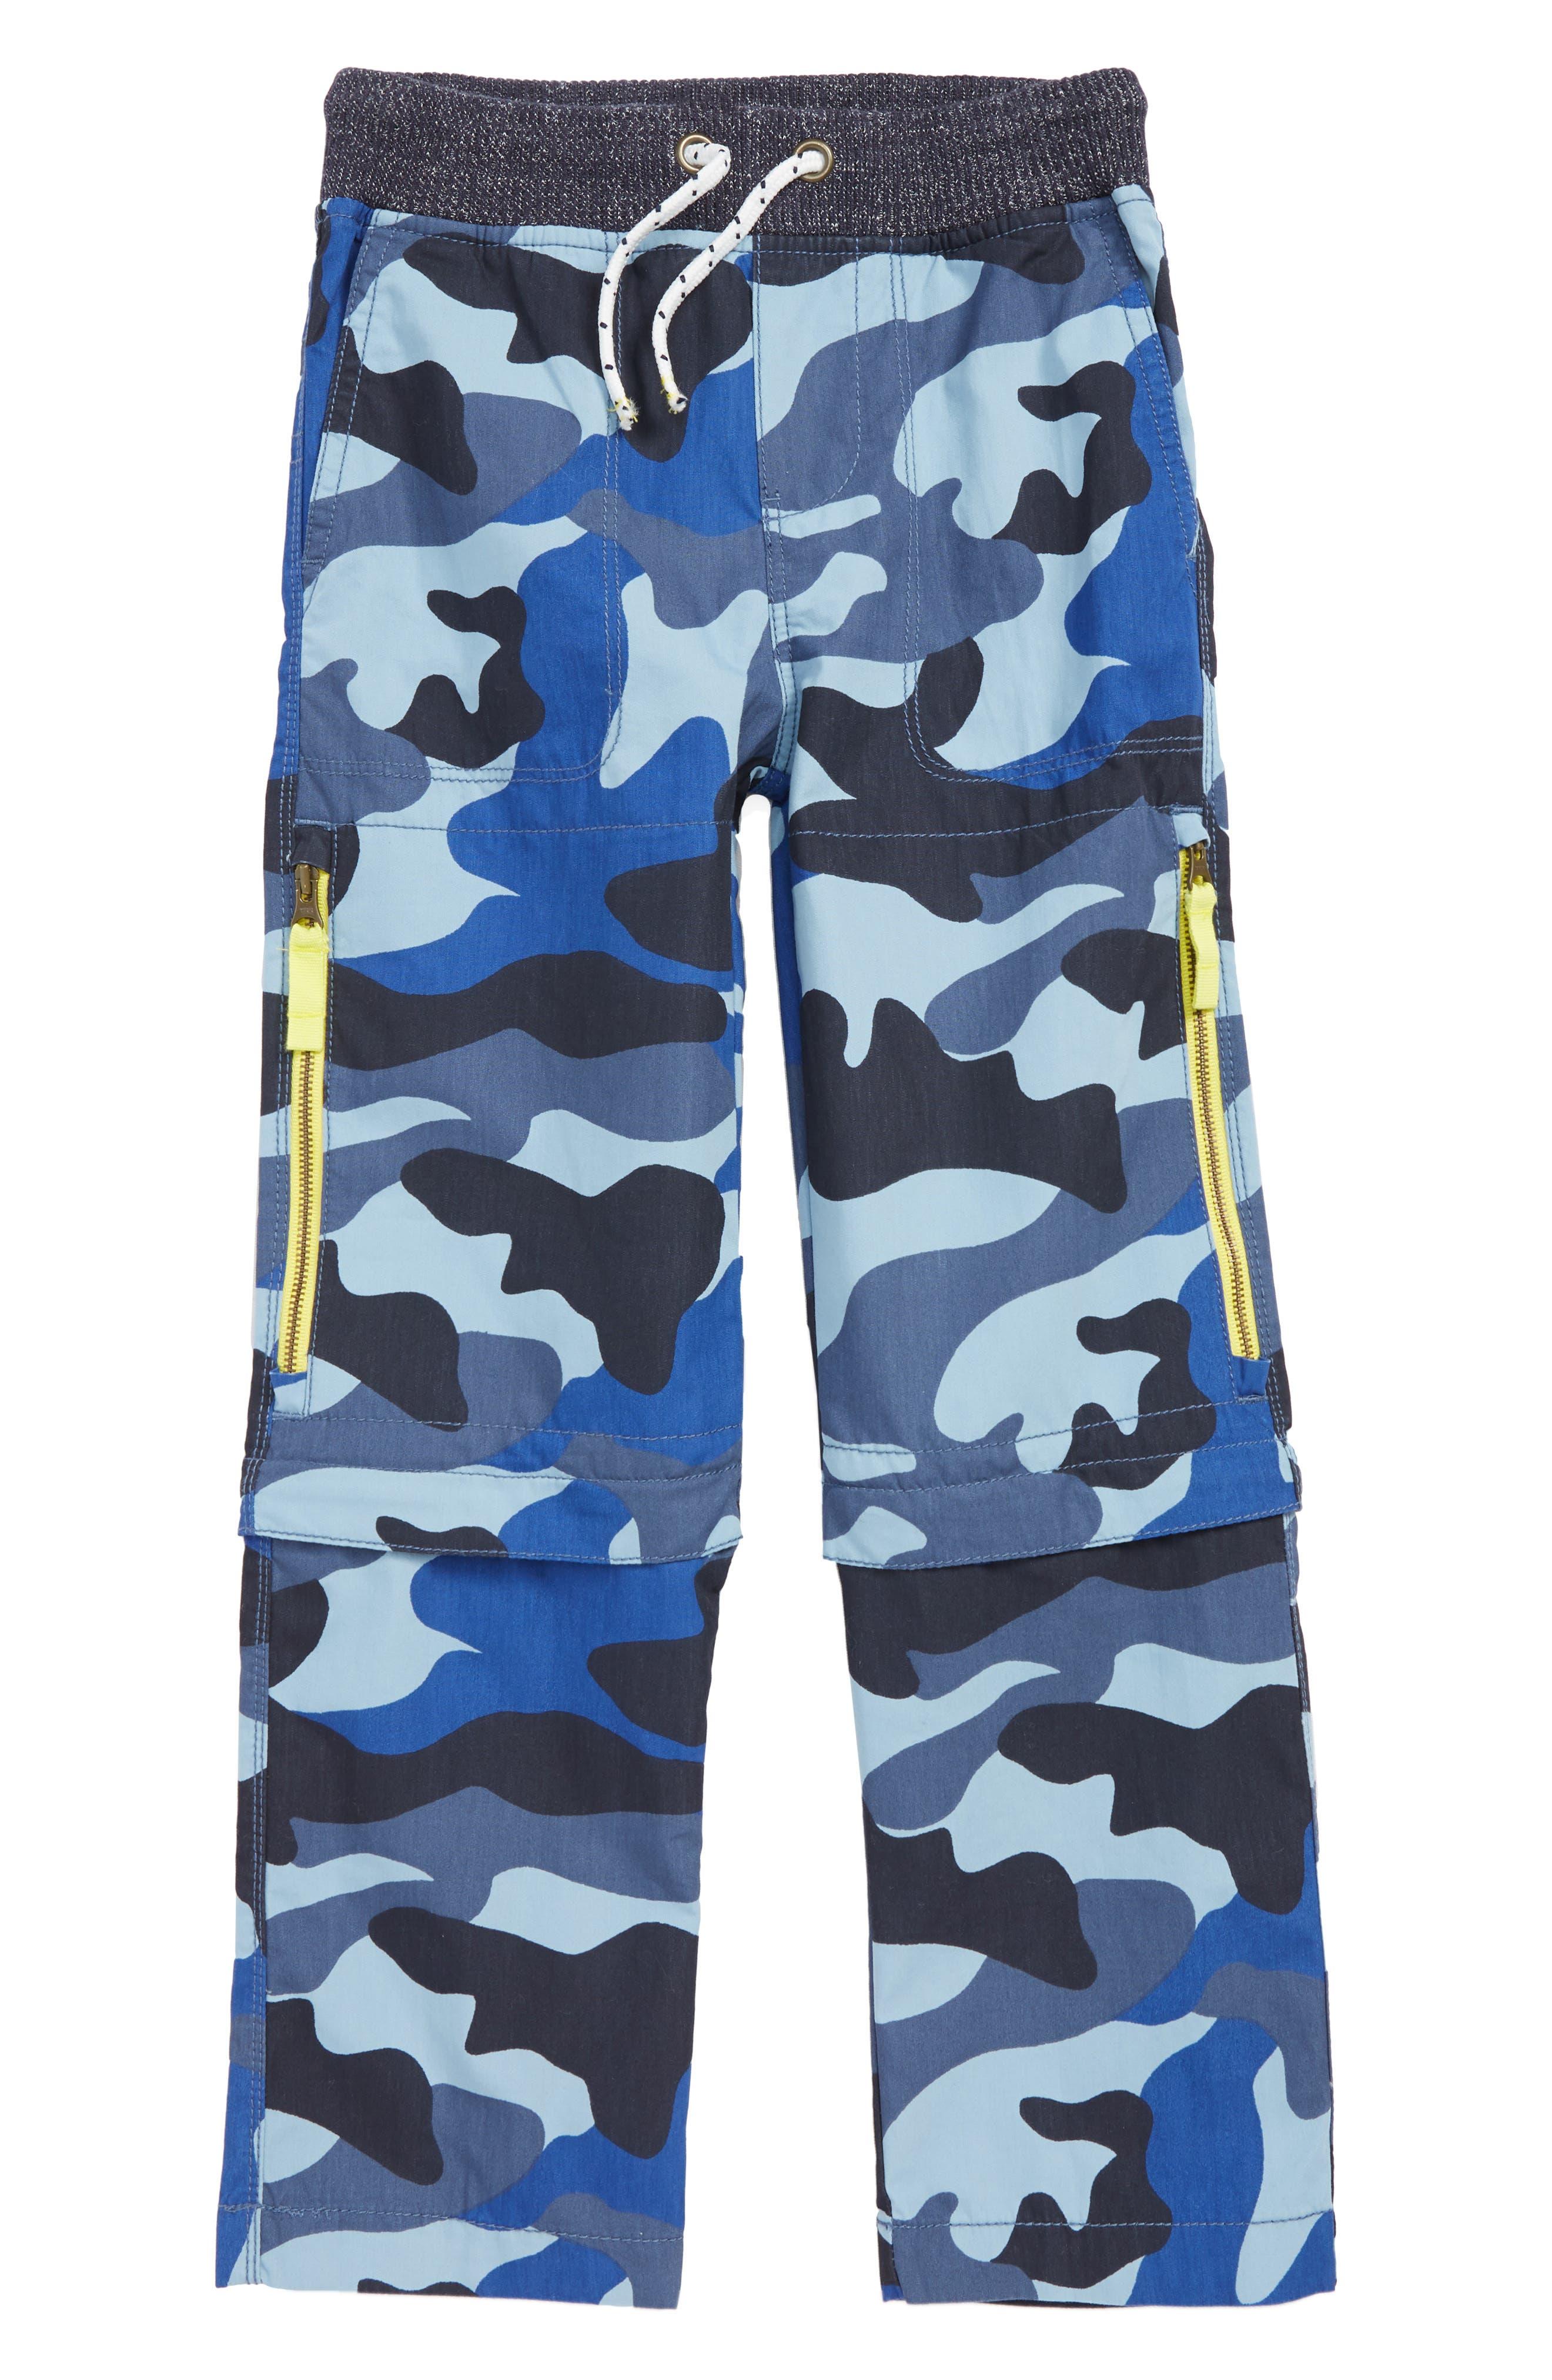 Techno Convertible Zip Off Pants,                             Main thumbnail 1, color,                             COLLEGE BLUE CAMO